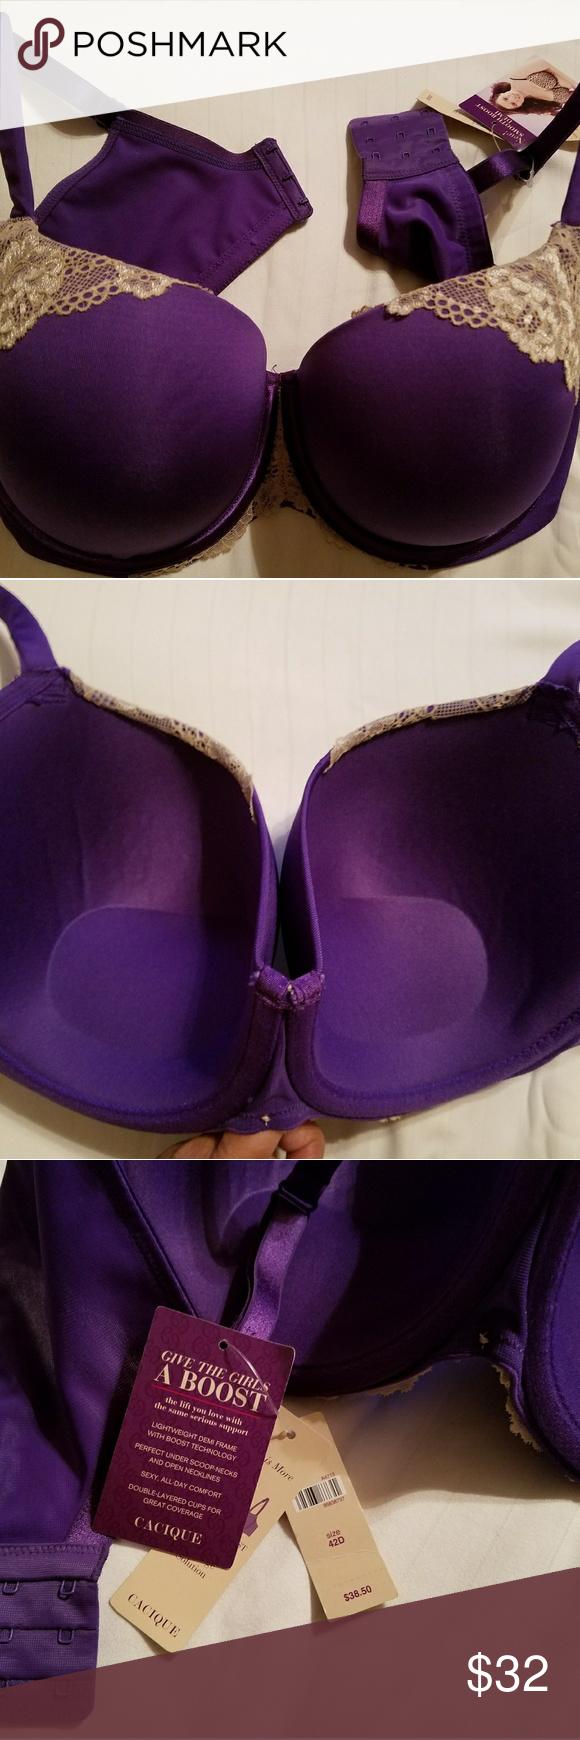 Lane Bryant NEW bra w/tags. Bra is very light weight yet very firm fit. Lane Bryant Intimates & Sleepwear Bras